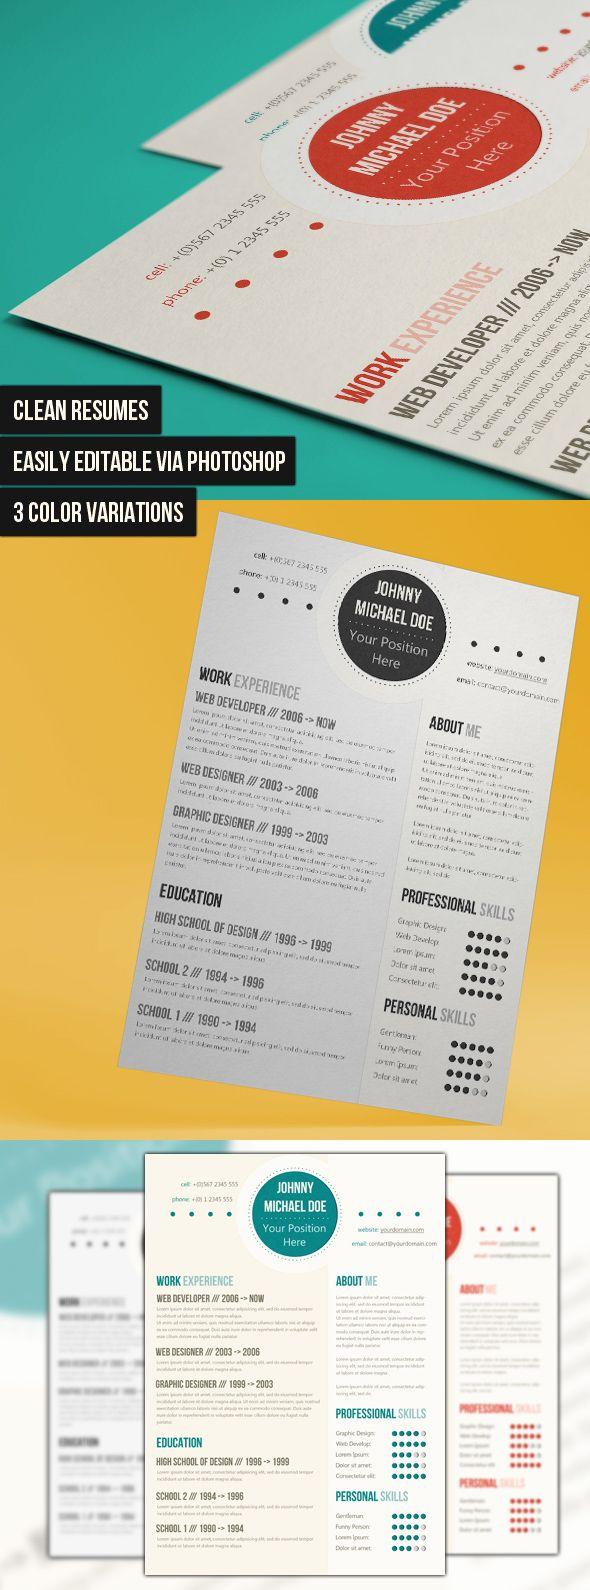 A List of Popular Modern Resume Templates